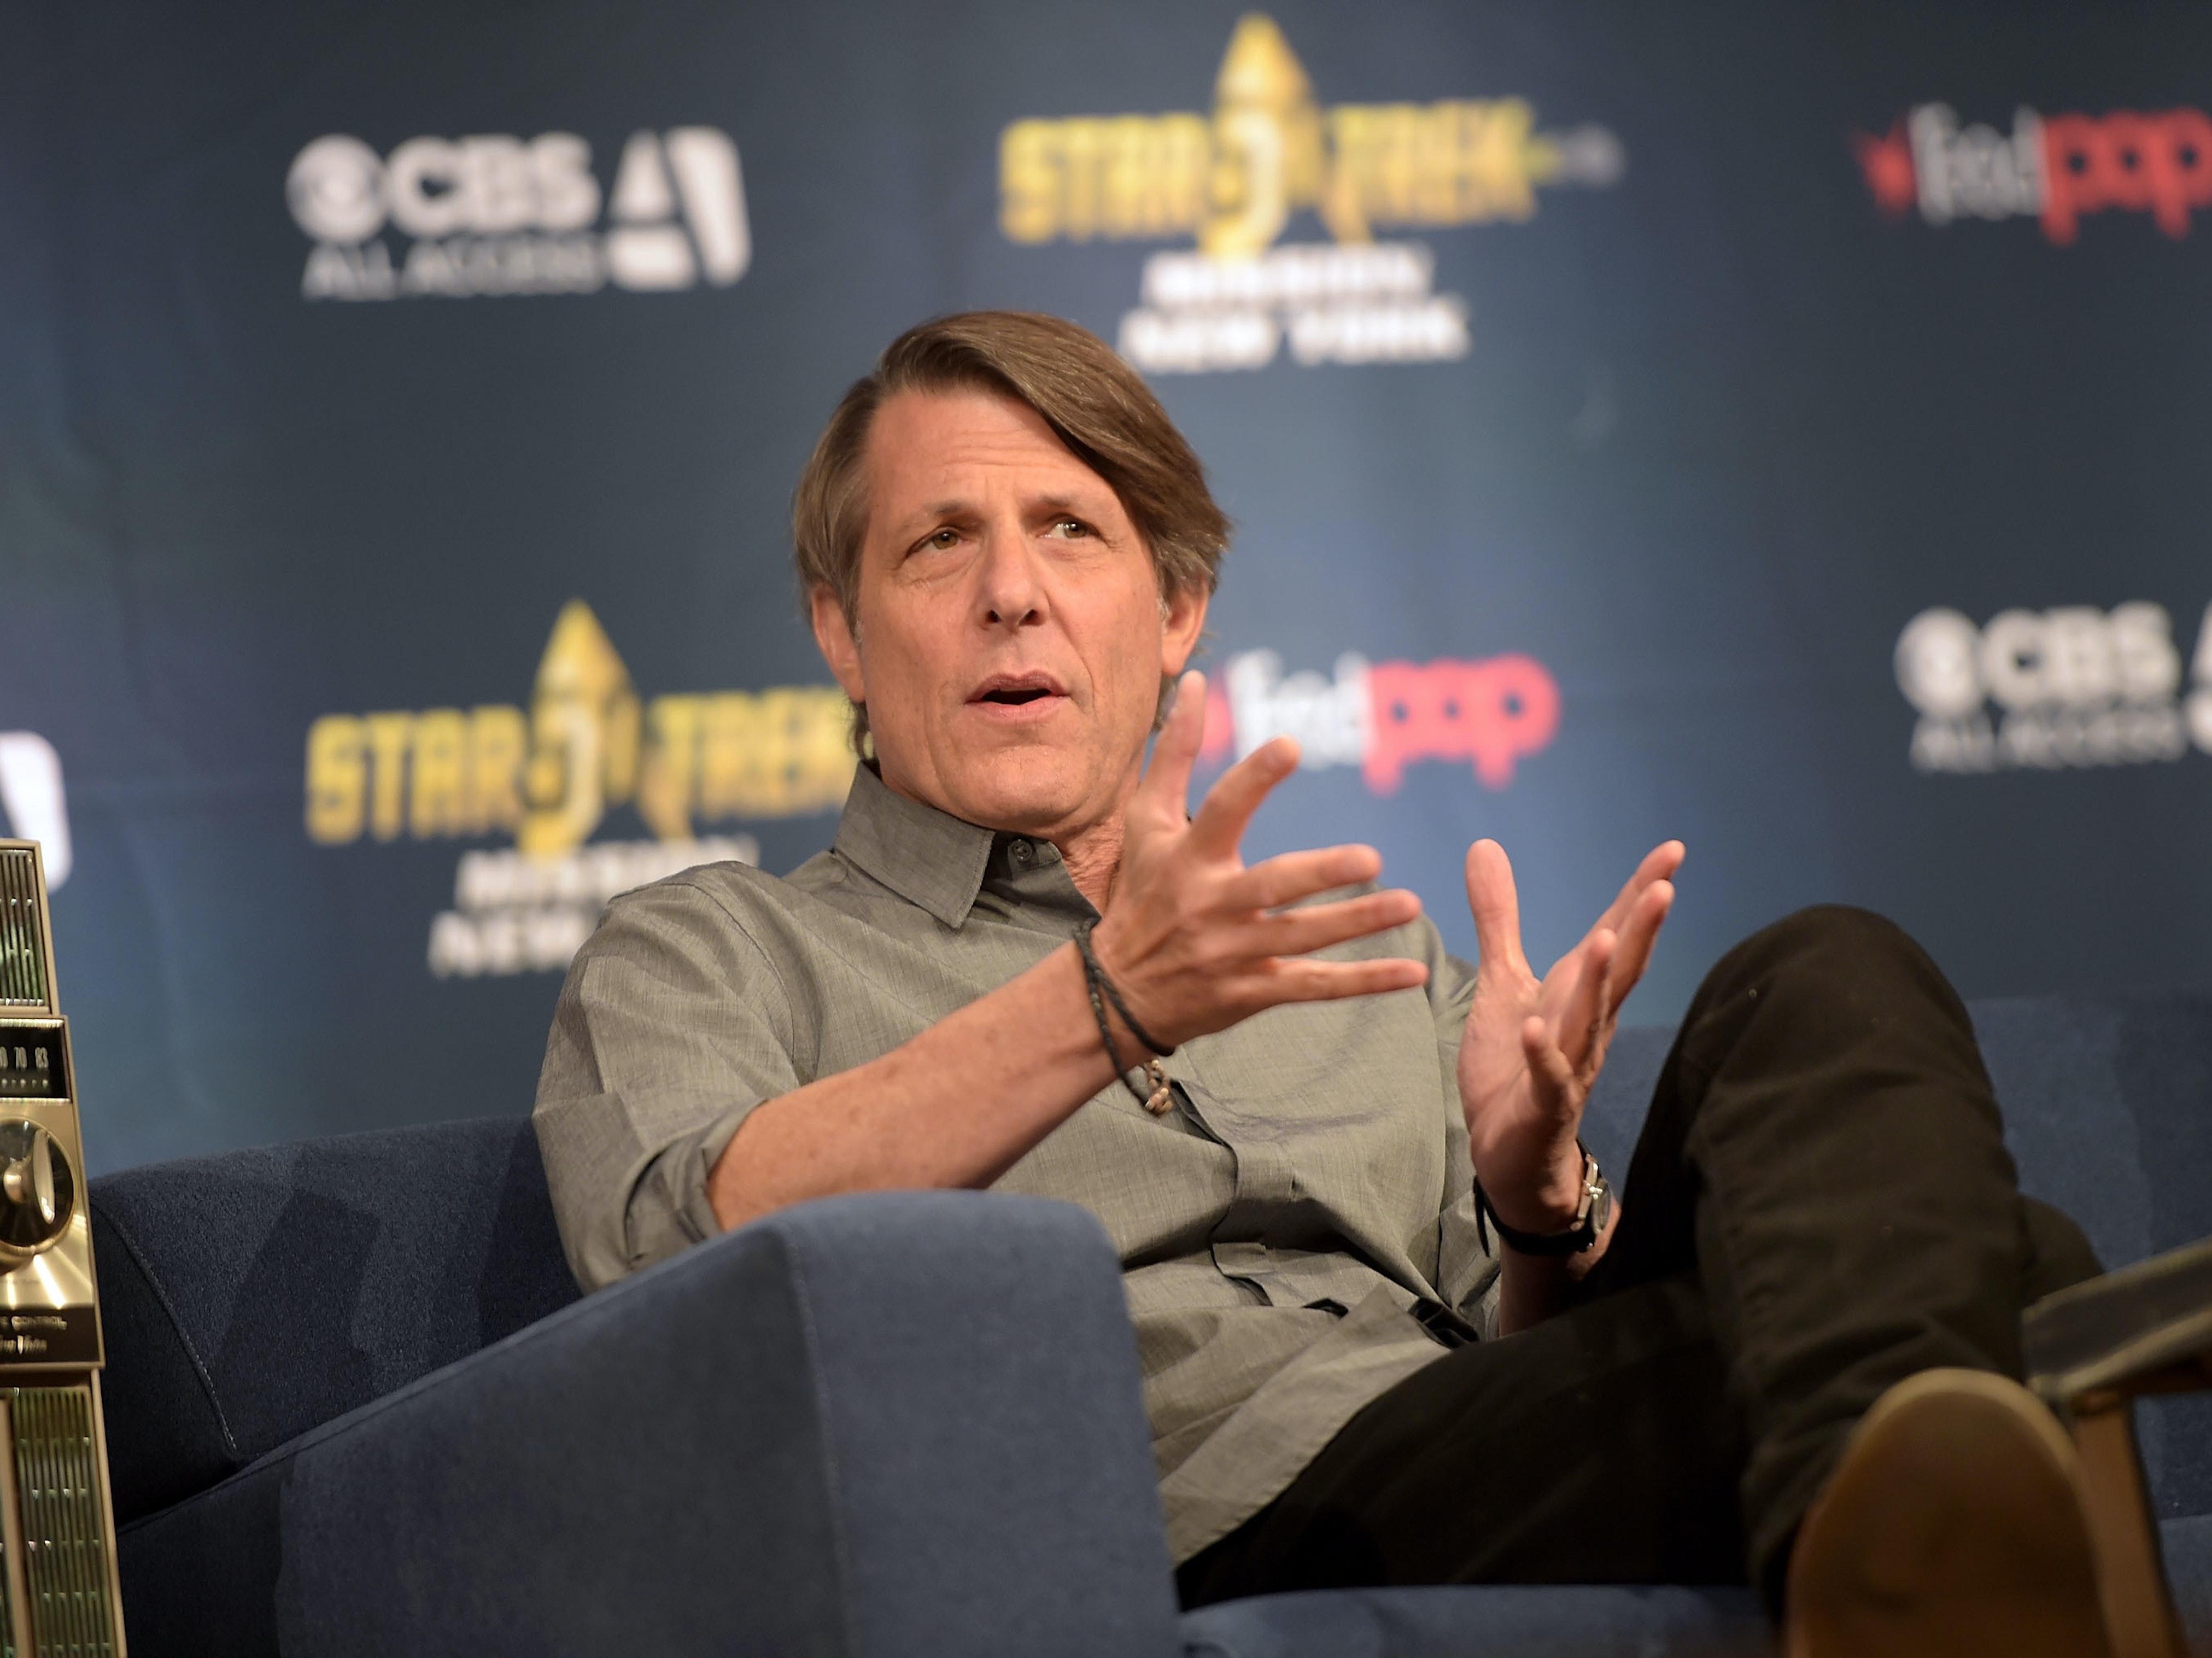 Leonard Nimoy's Son Explains How He'd Direct 'Star Wars'